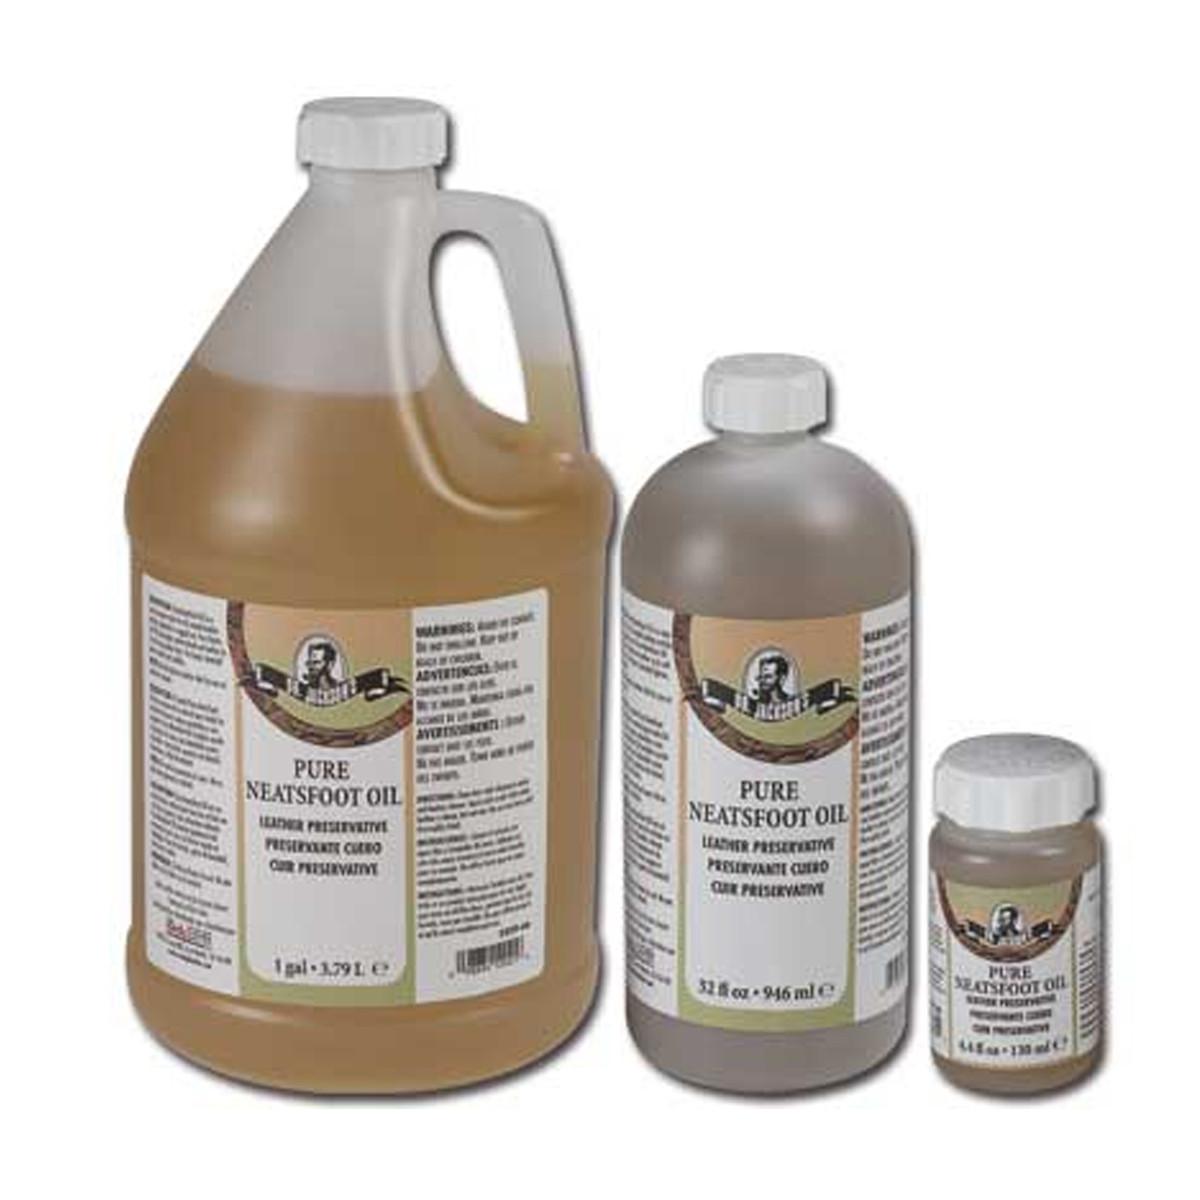 Pure Neatsfoot Oil - 473 ml